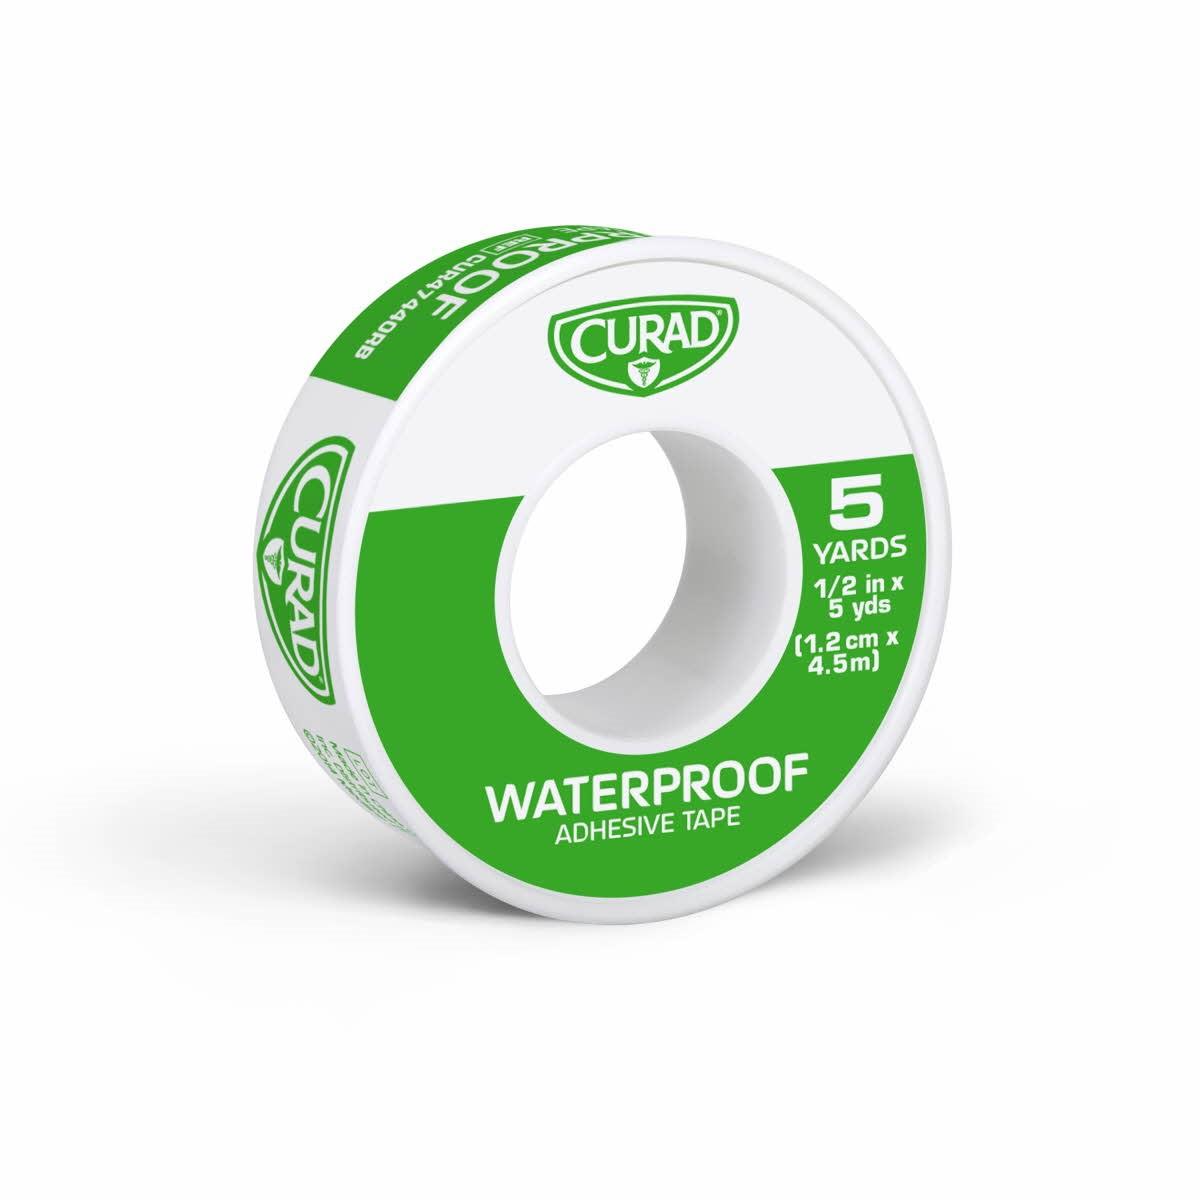 Curad Waterproof Adhesive Tape, White, 5 Yds